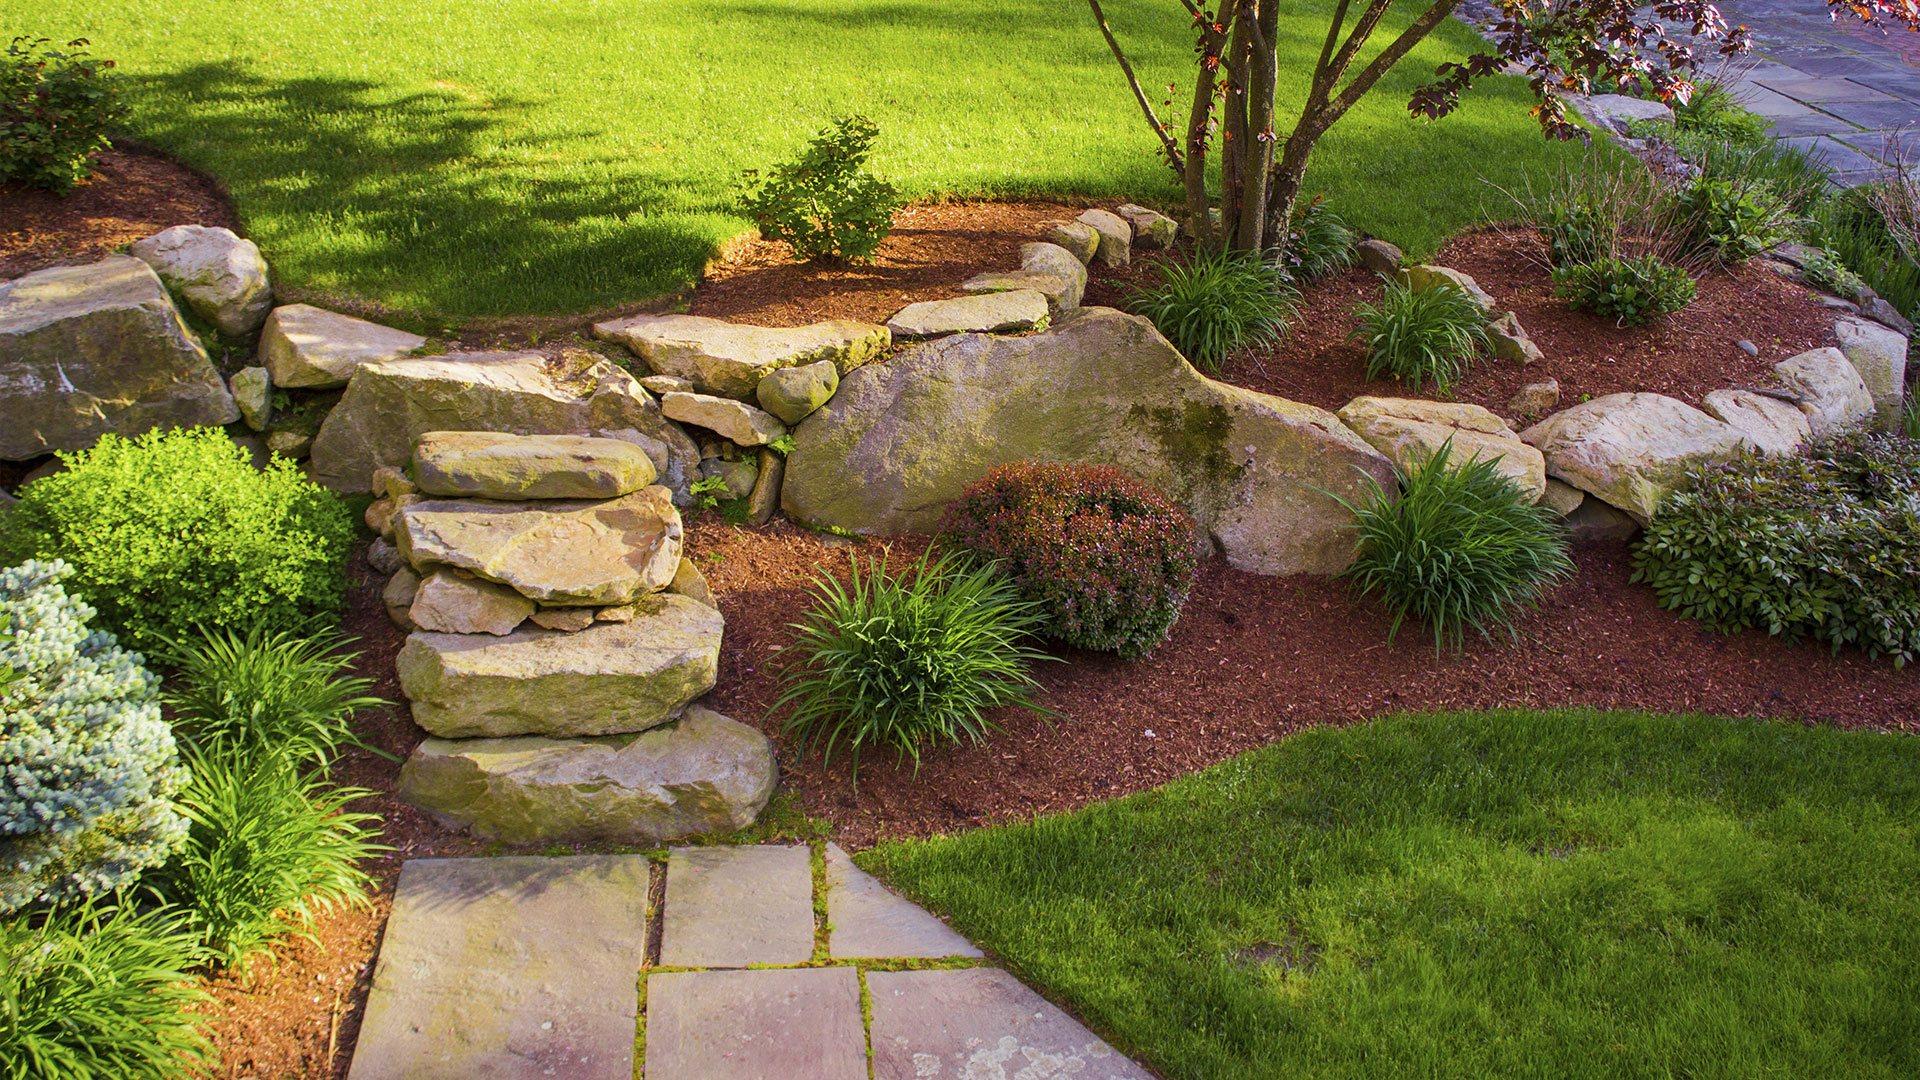 Green Leaf Property Management Services Commercial Garden Design, Commercial Landscaping and Commercial Property Maintenance slide 3